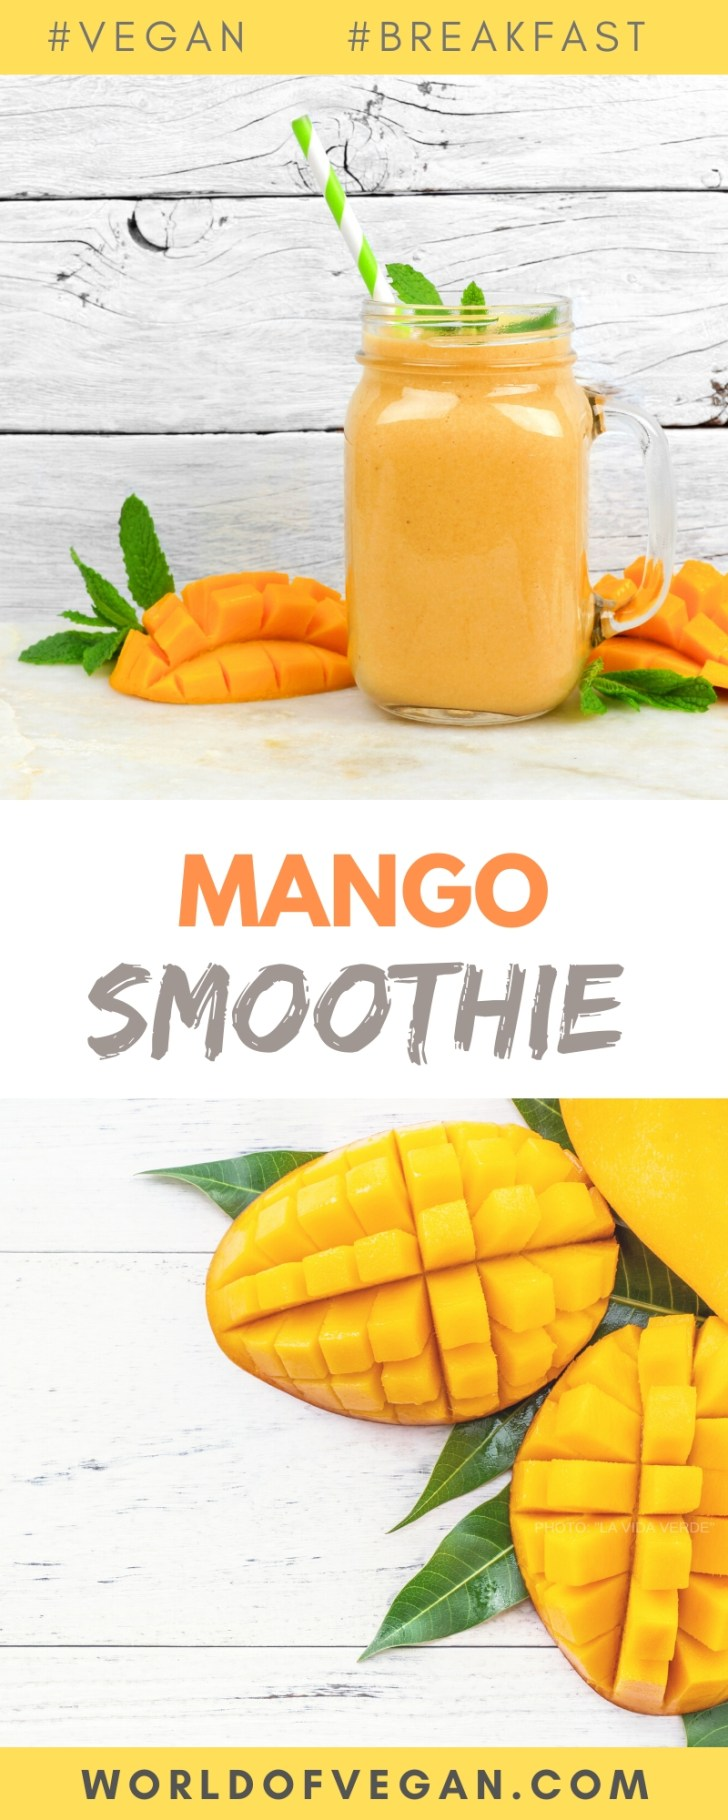 Tropical Mango Smoothie   World of Vegan   #mango #banana #smoothie #breakfast #vegan #worldofvegan